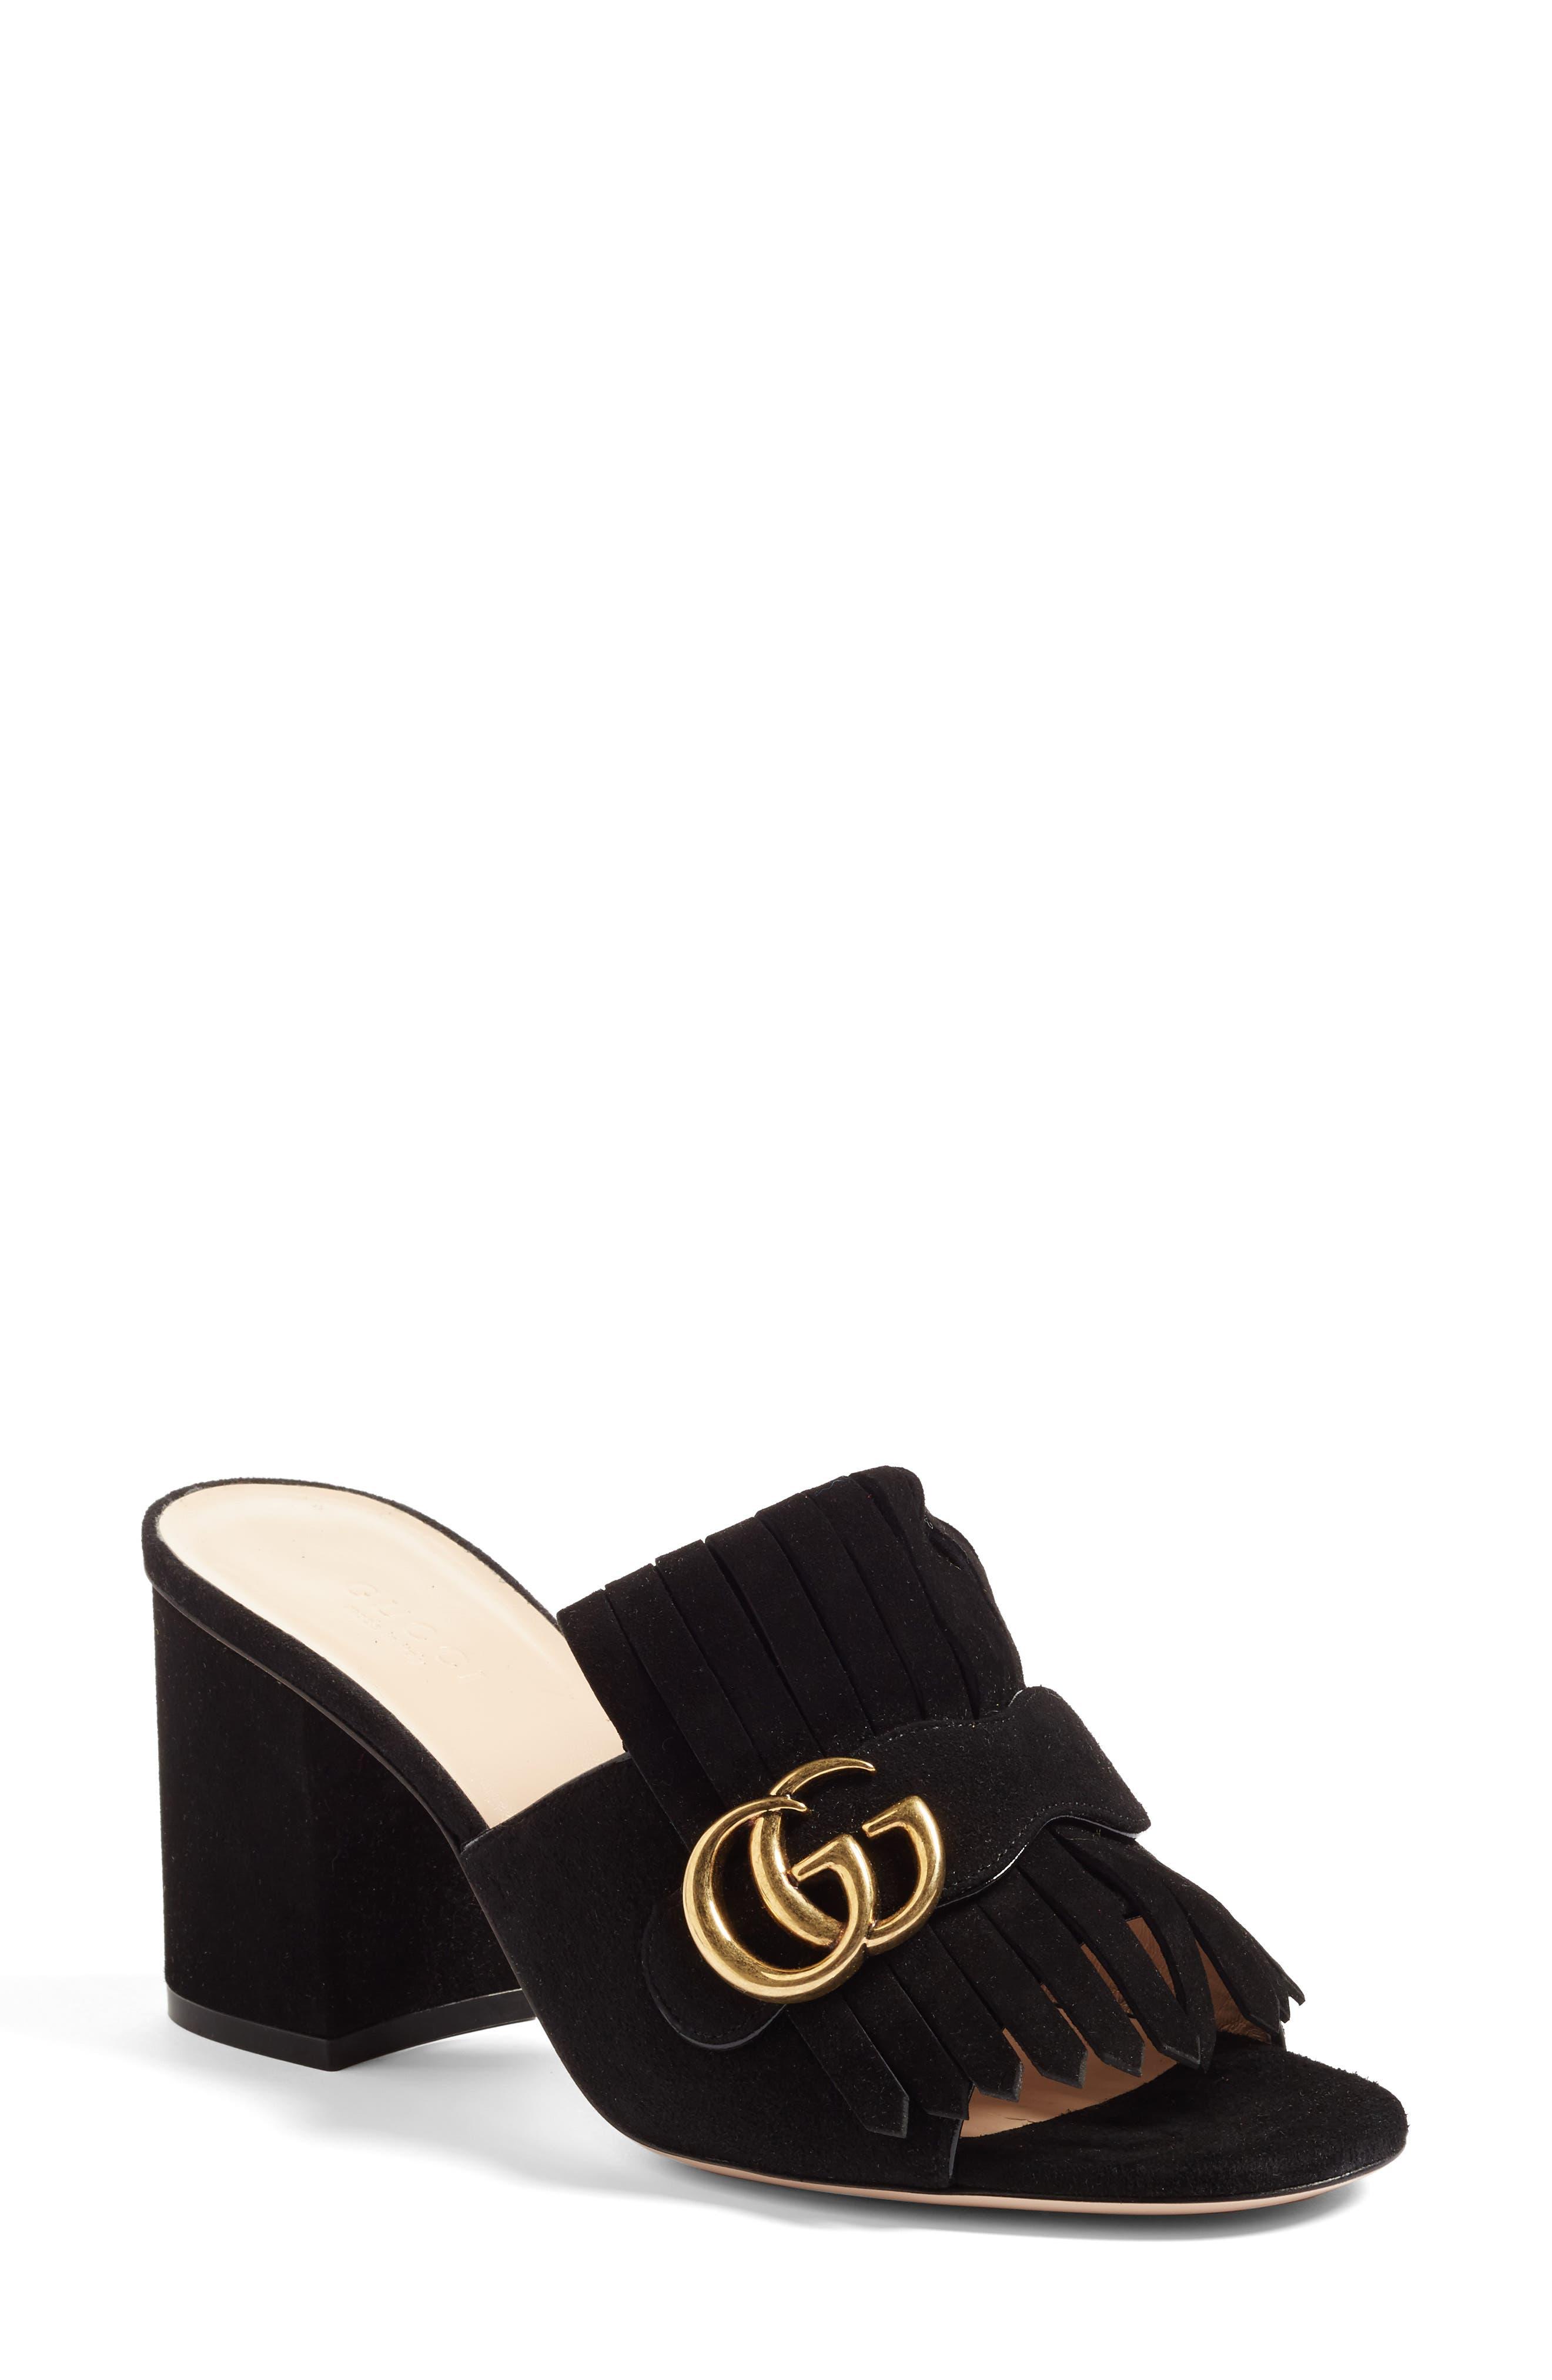 Gucci Gg Marmont Peep Toe Mule